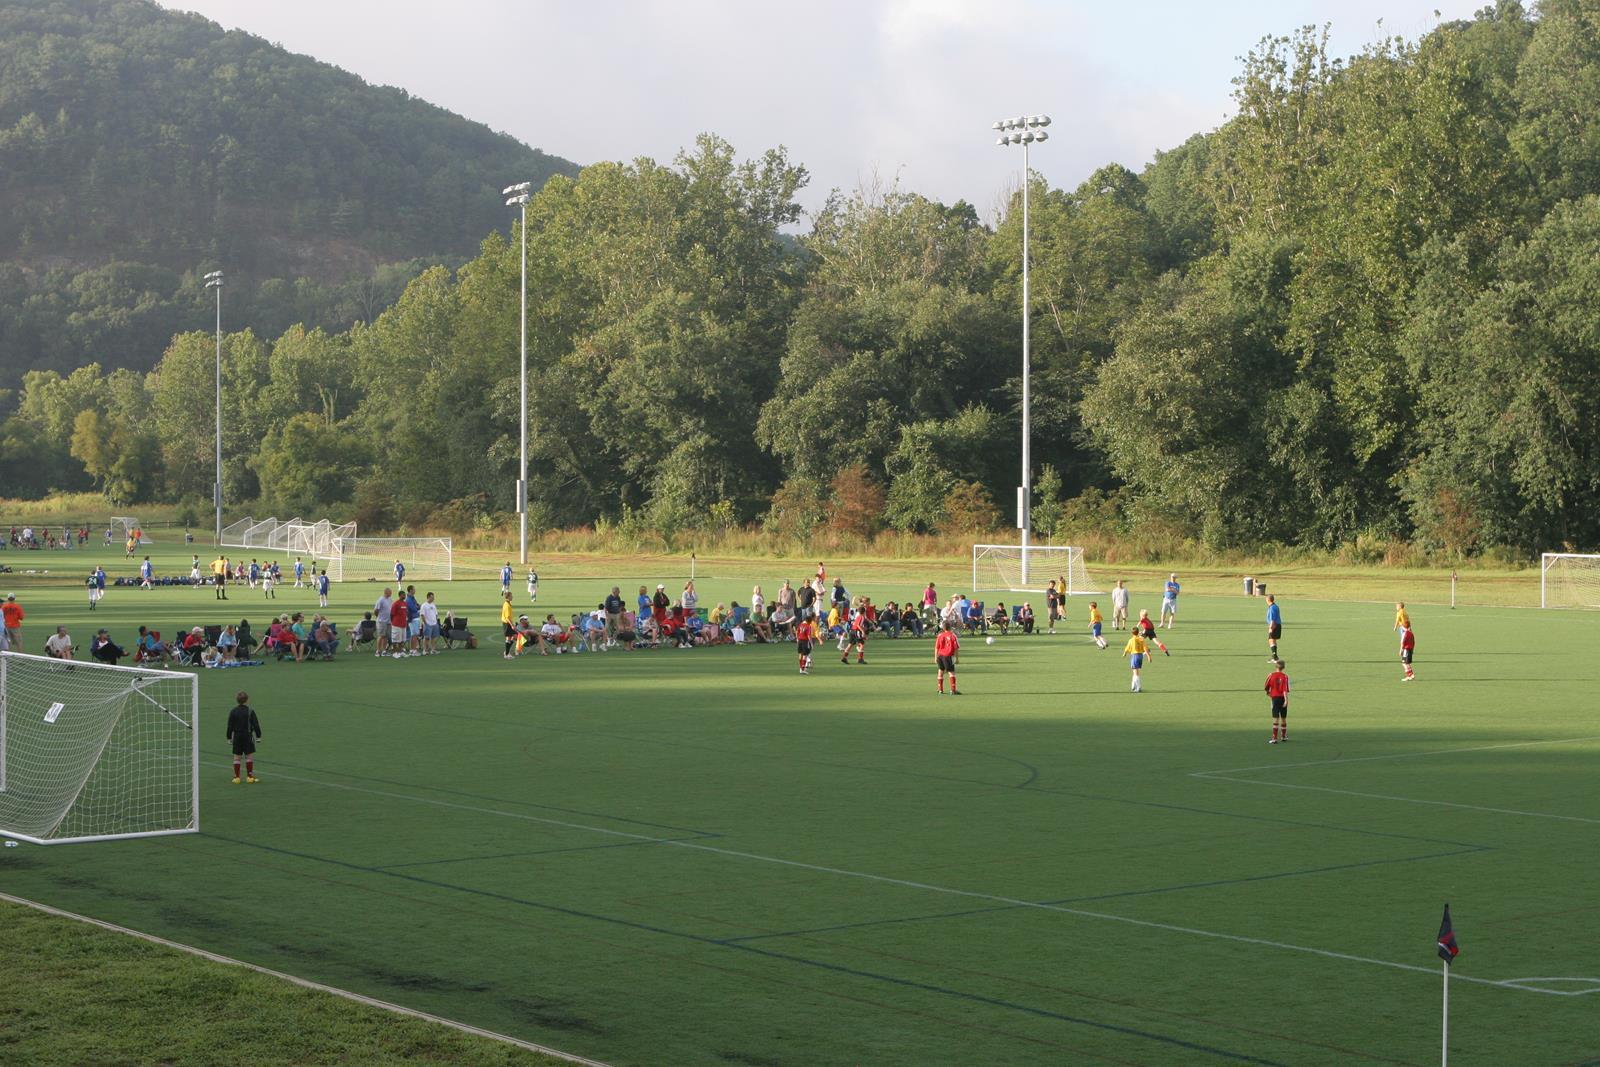 John B. Lewis Soccer Complex